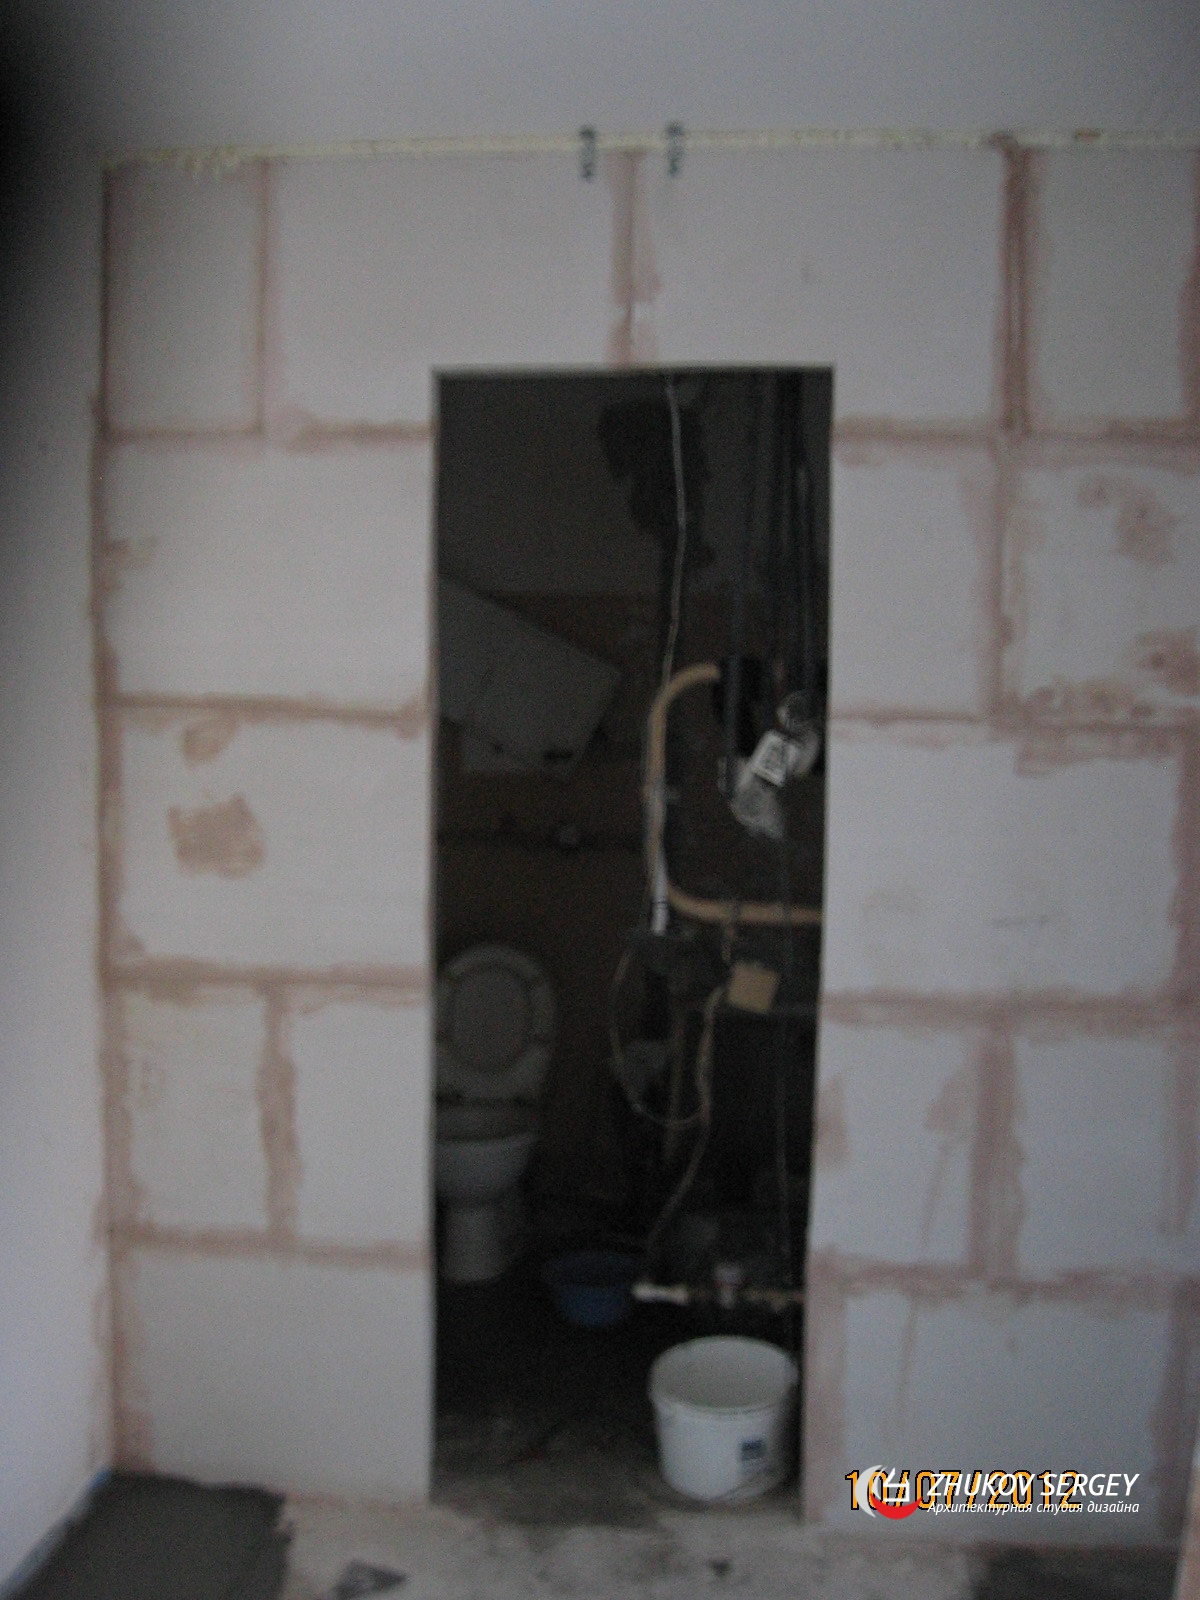 Пазогребневые плиты (ПГП) 67